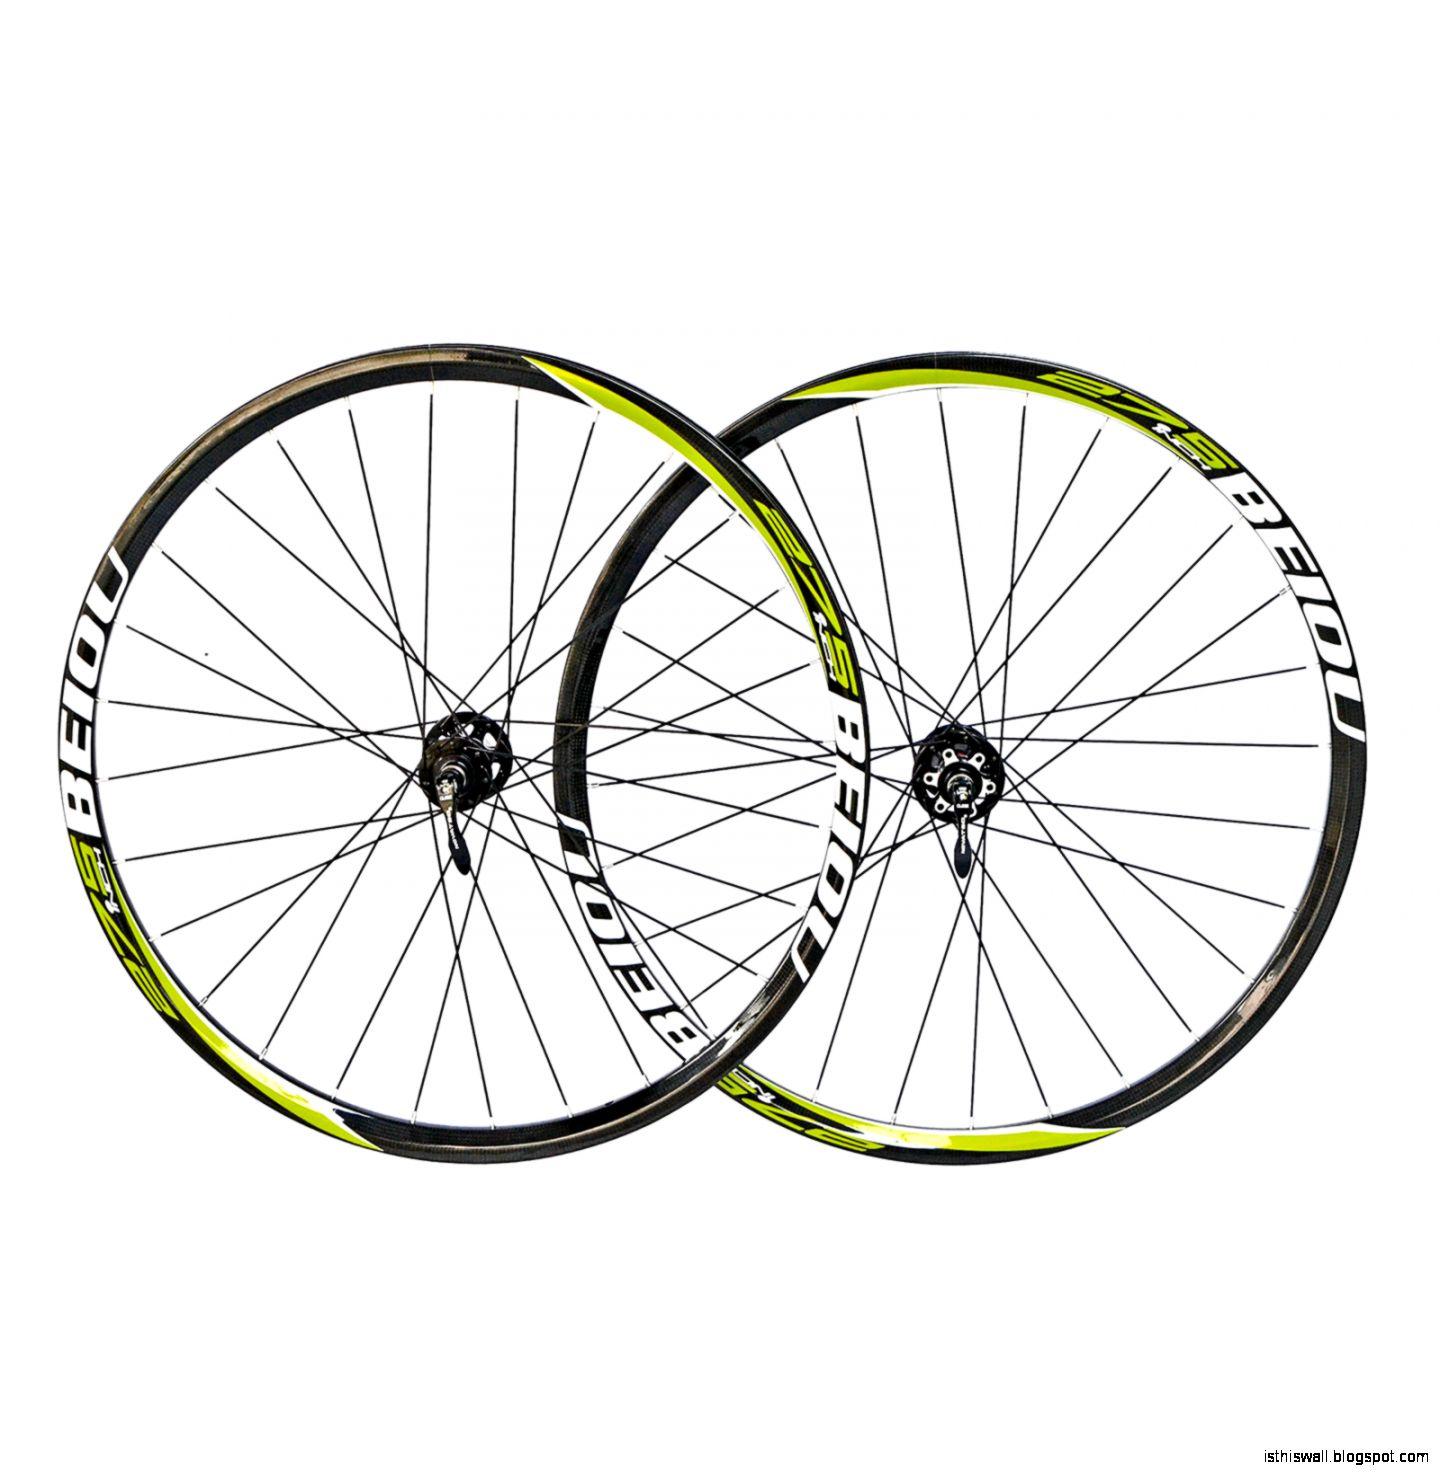 24mm Width Carbon Fiber Mountain Bike Wheelset Super Strength ZM25BY